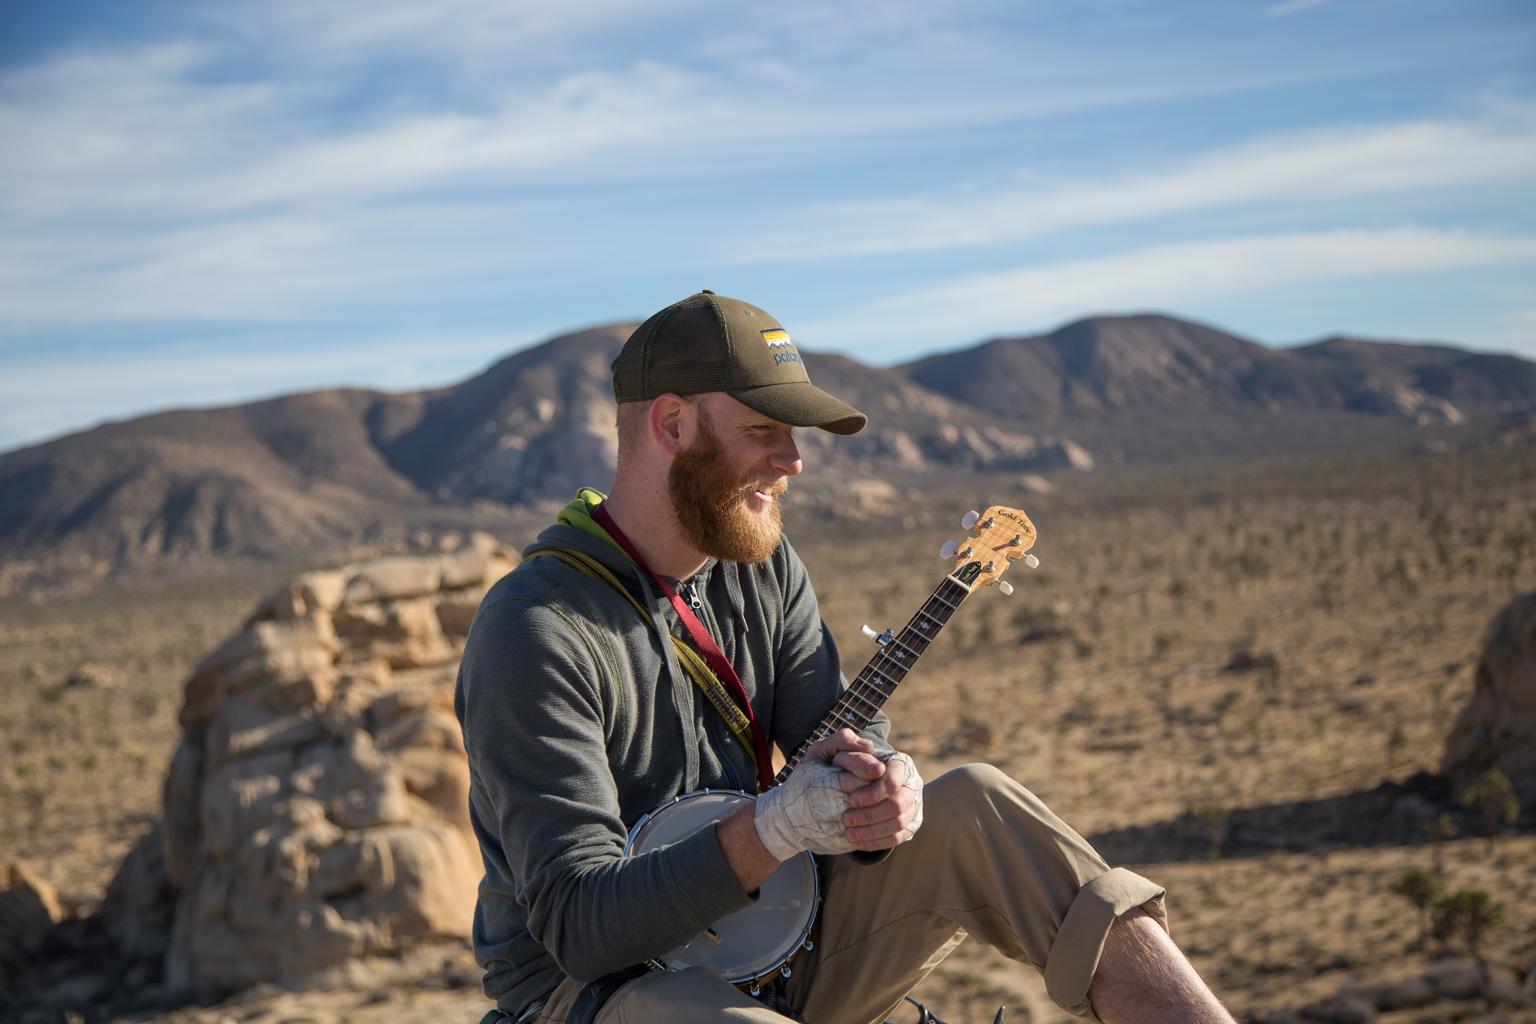 Craig playing banjo on top of Chimney Rock, Joshua Tree